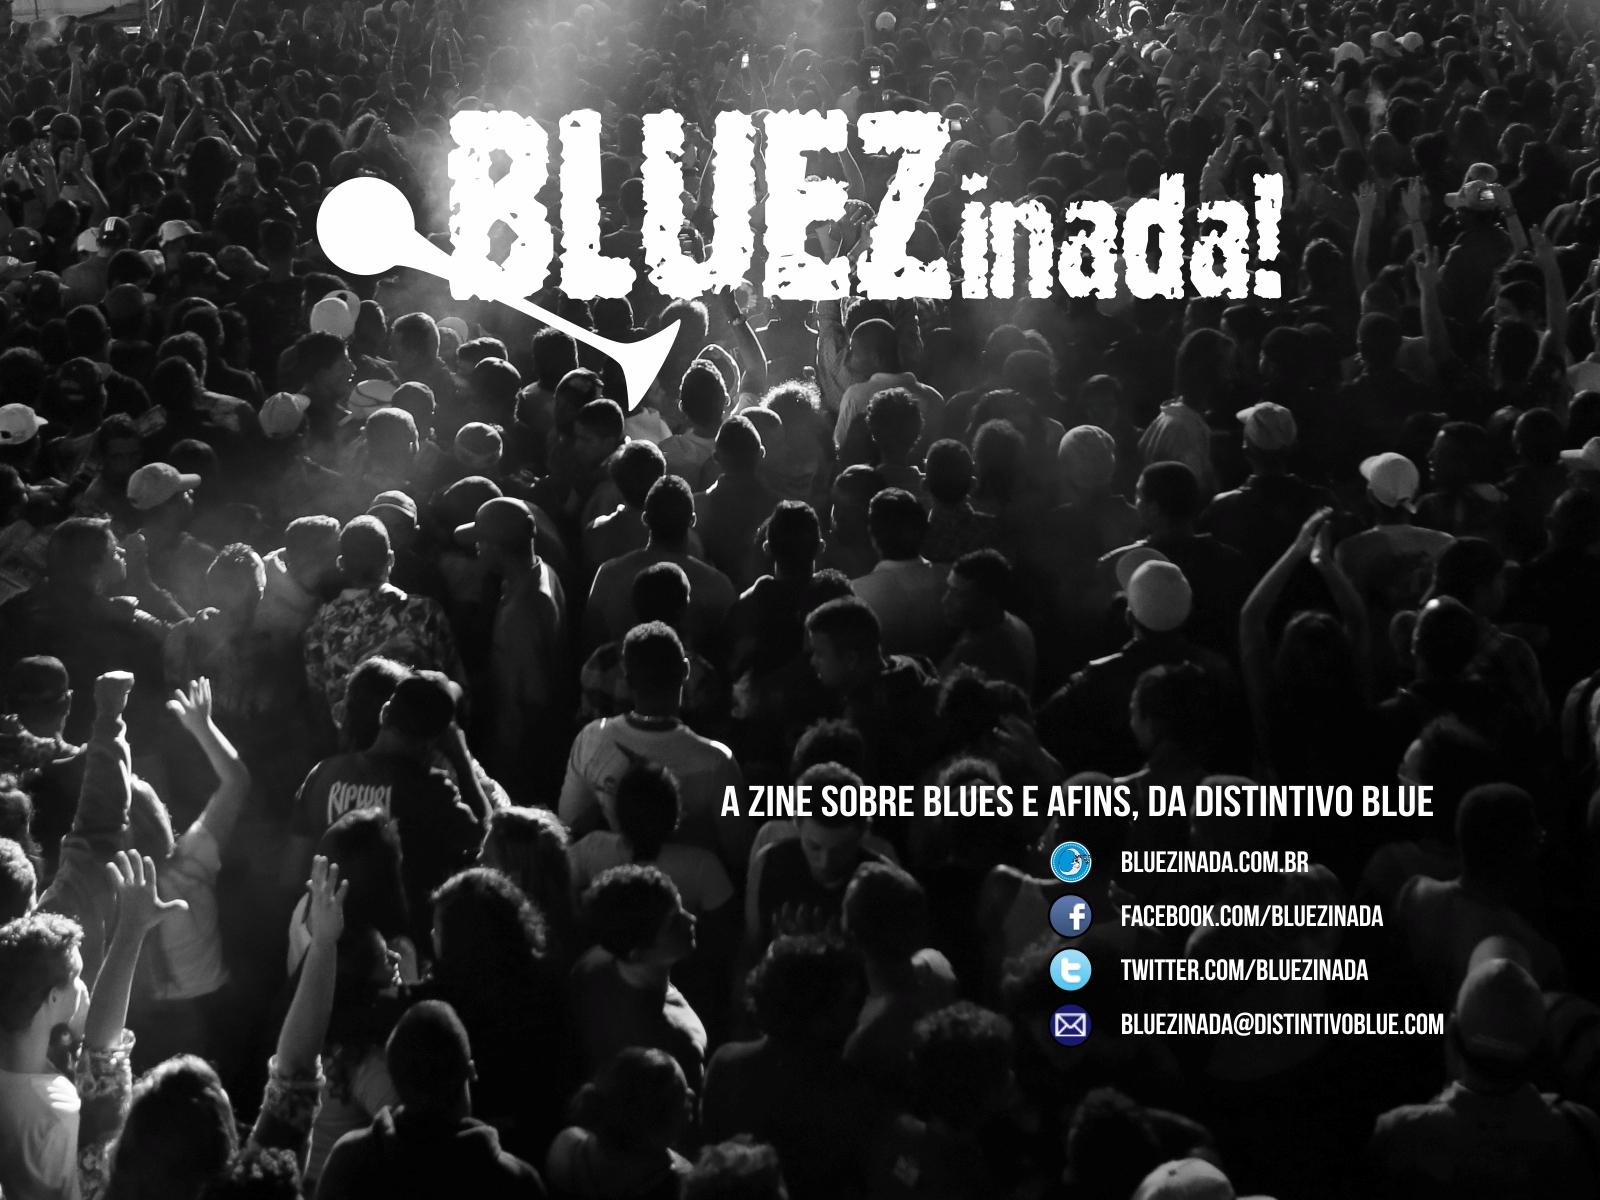 Bluezinada bgfacebook